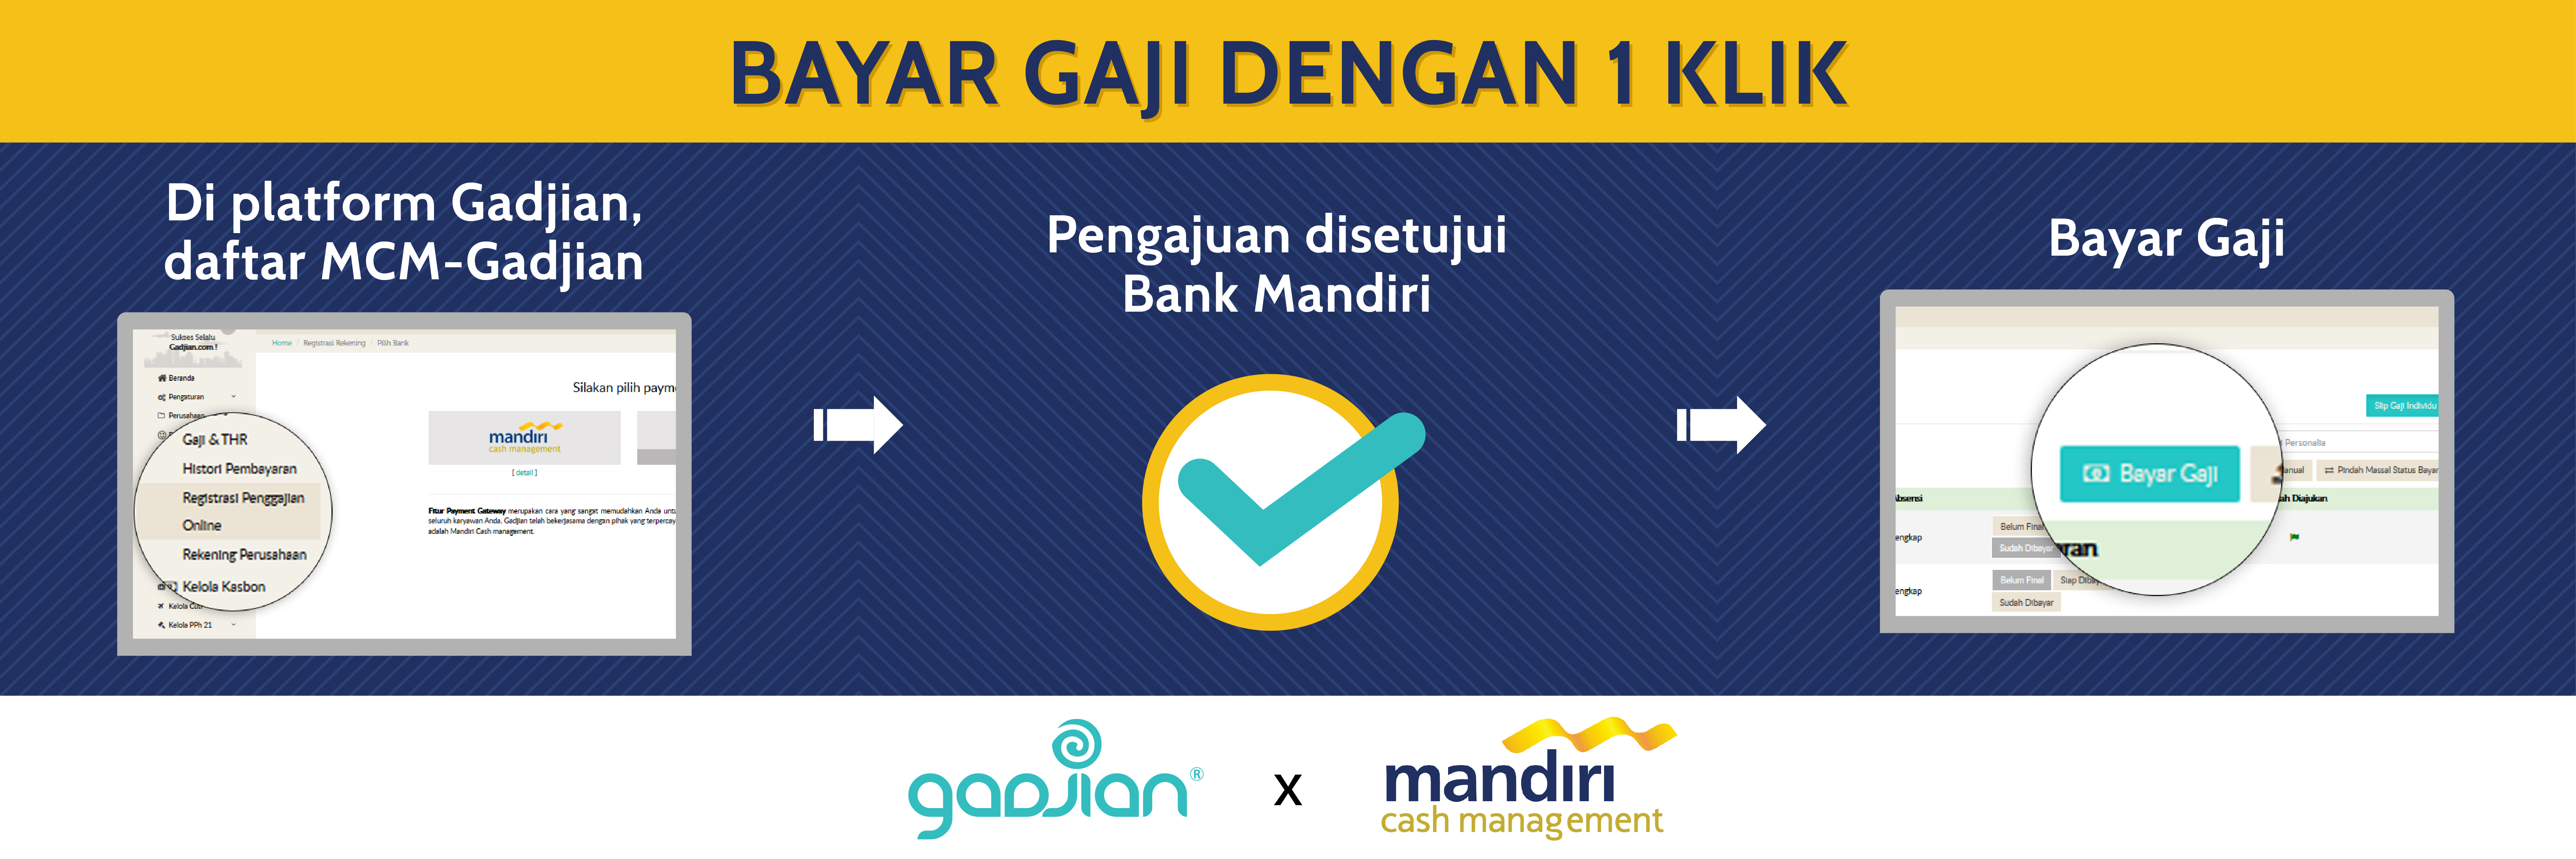 Integrasi Aplikasi Pembayaran Gaji Gadjian dan Mandiri Cash Management (MCM) | Gadjian